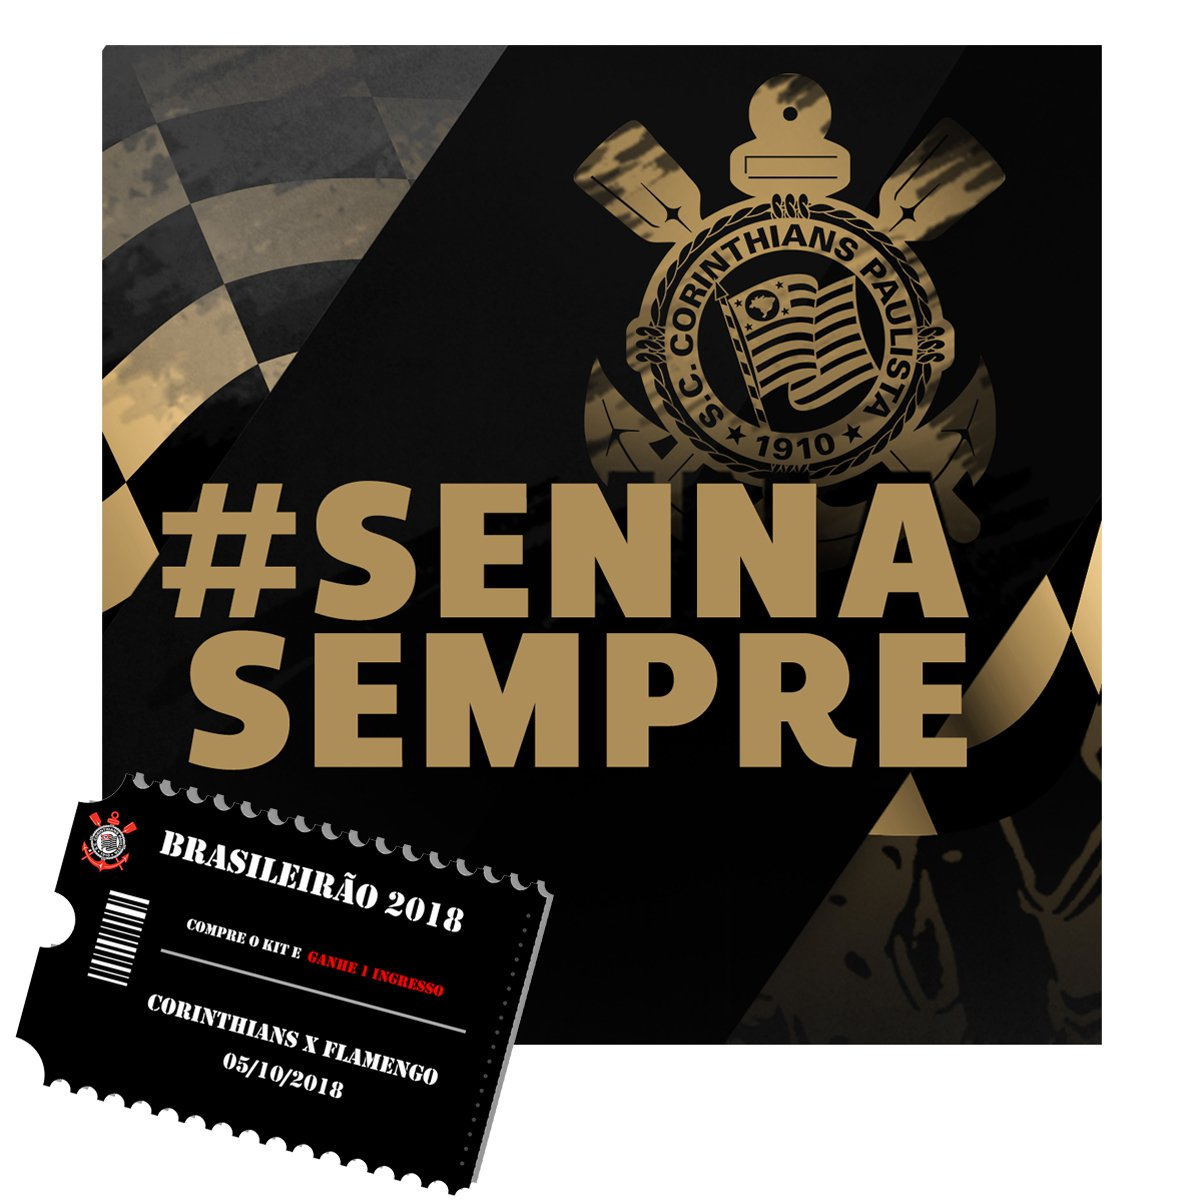 Kit Camisa Corinthians III 2018 s n° - Torcedor Nike Feminina + Ingresso  Jogo COR X FLA - Compre Agora  4de79e15bab